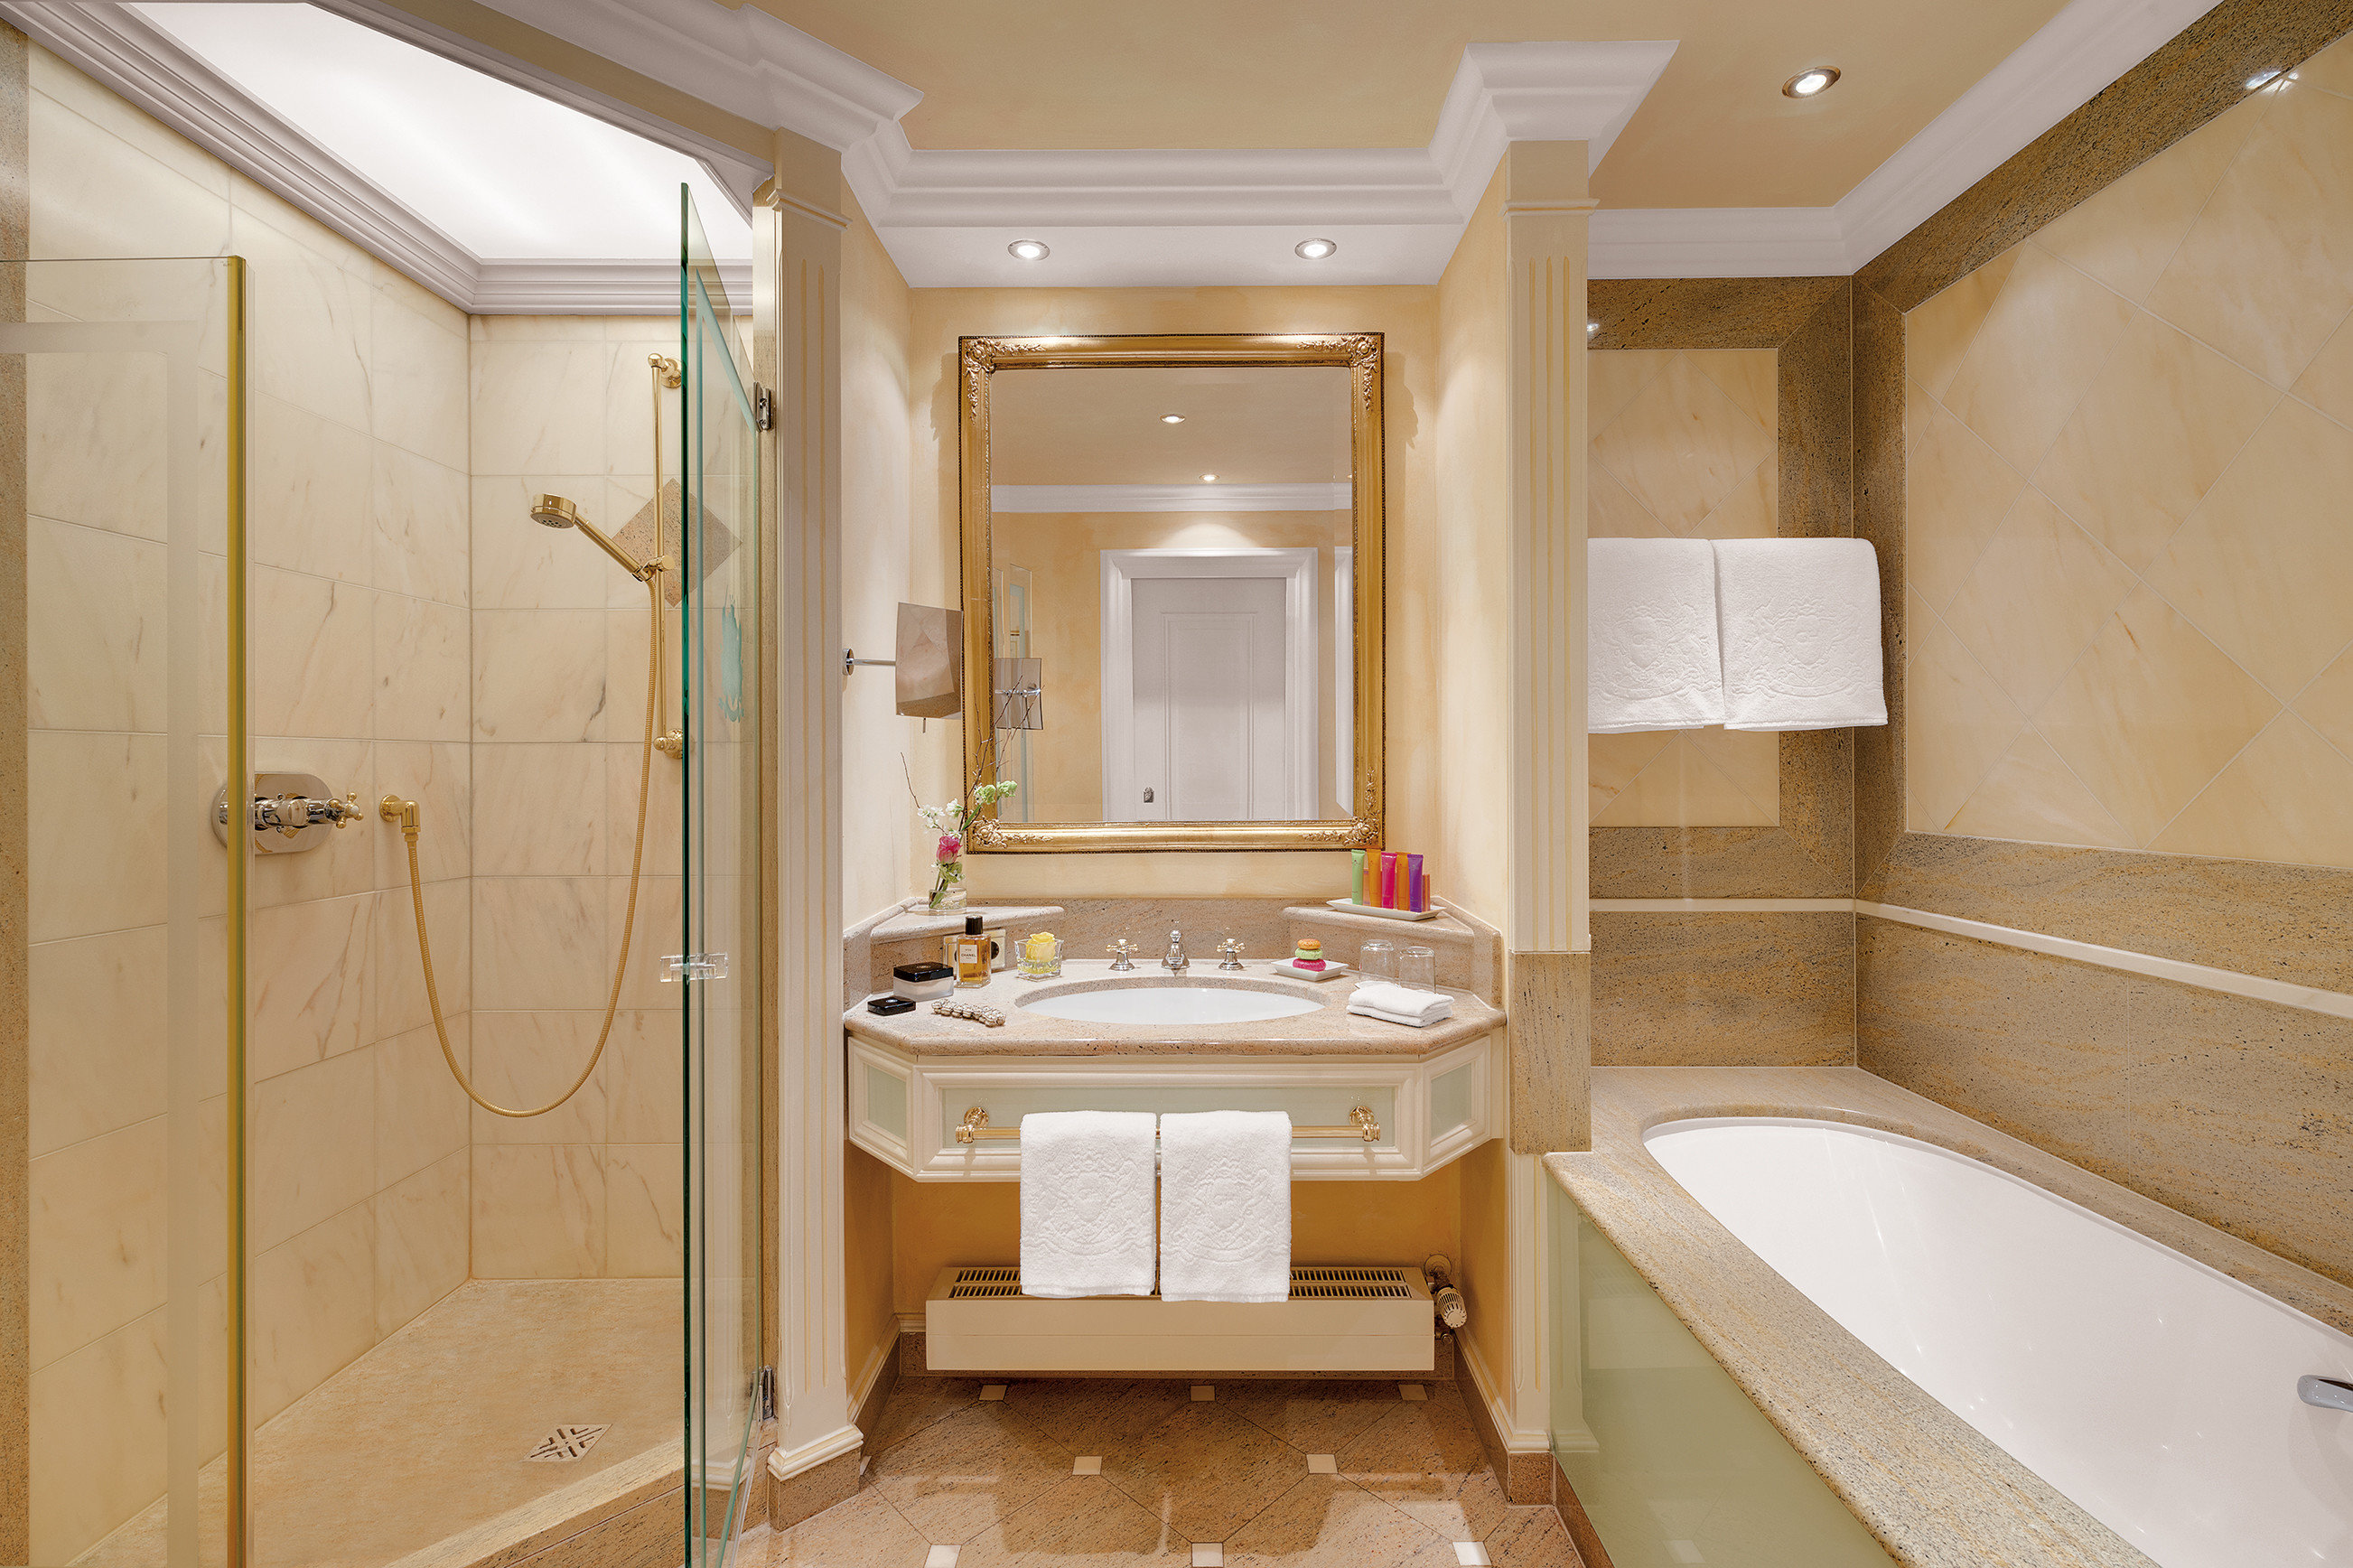 europe Germany Hotels Munich indoor bathroom wall room home interior design estate Suite real estate floor toilet